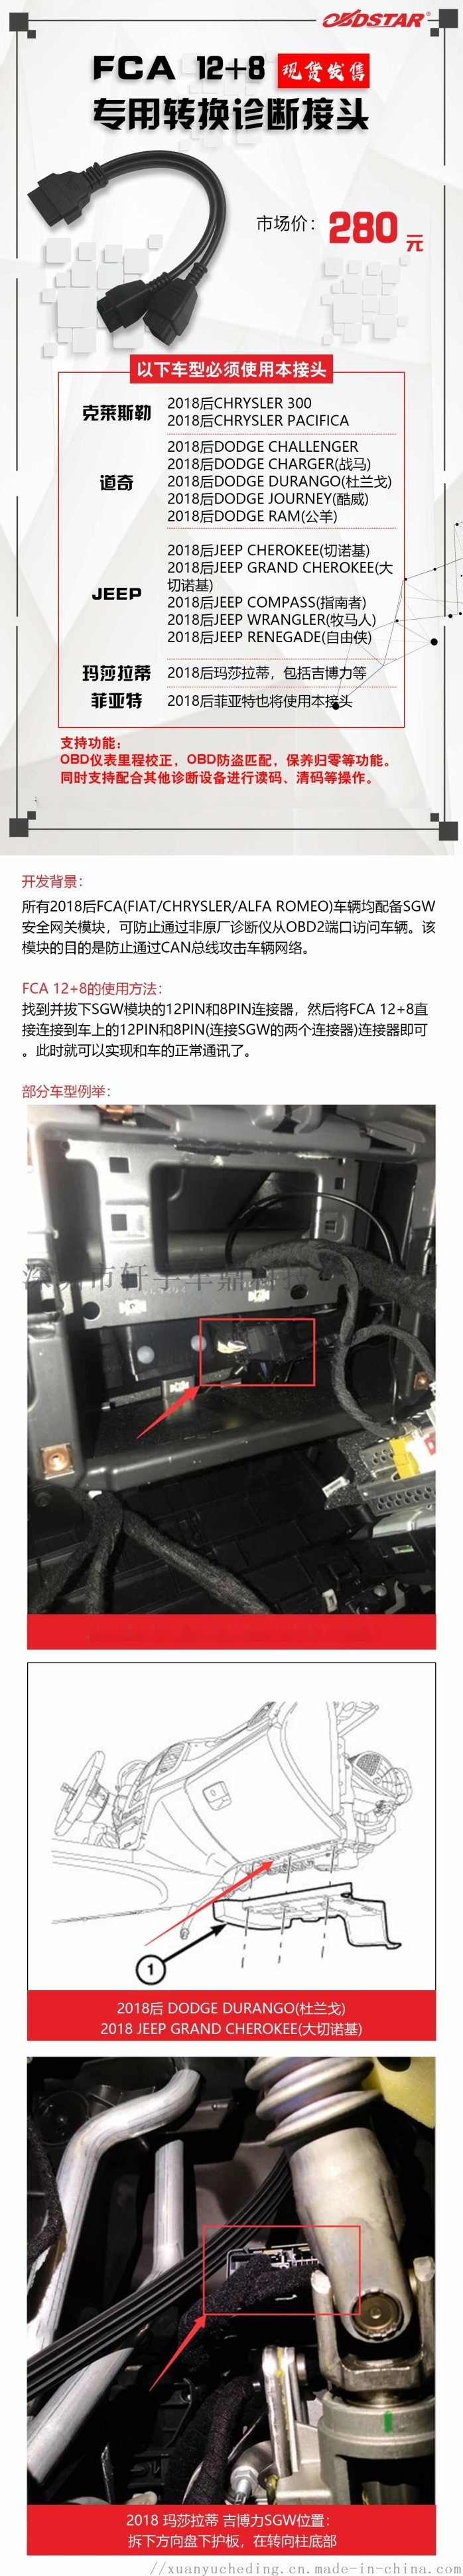 FCA12+8 现货发售.jpg